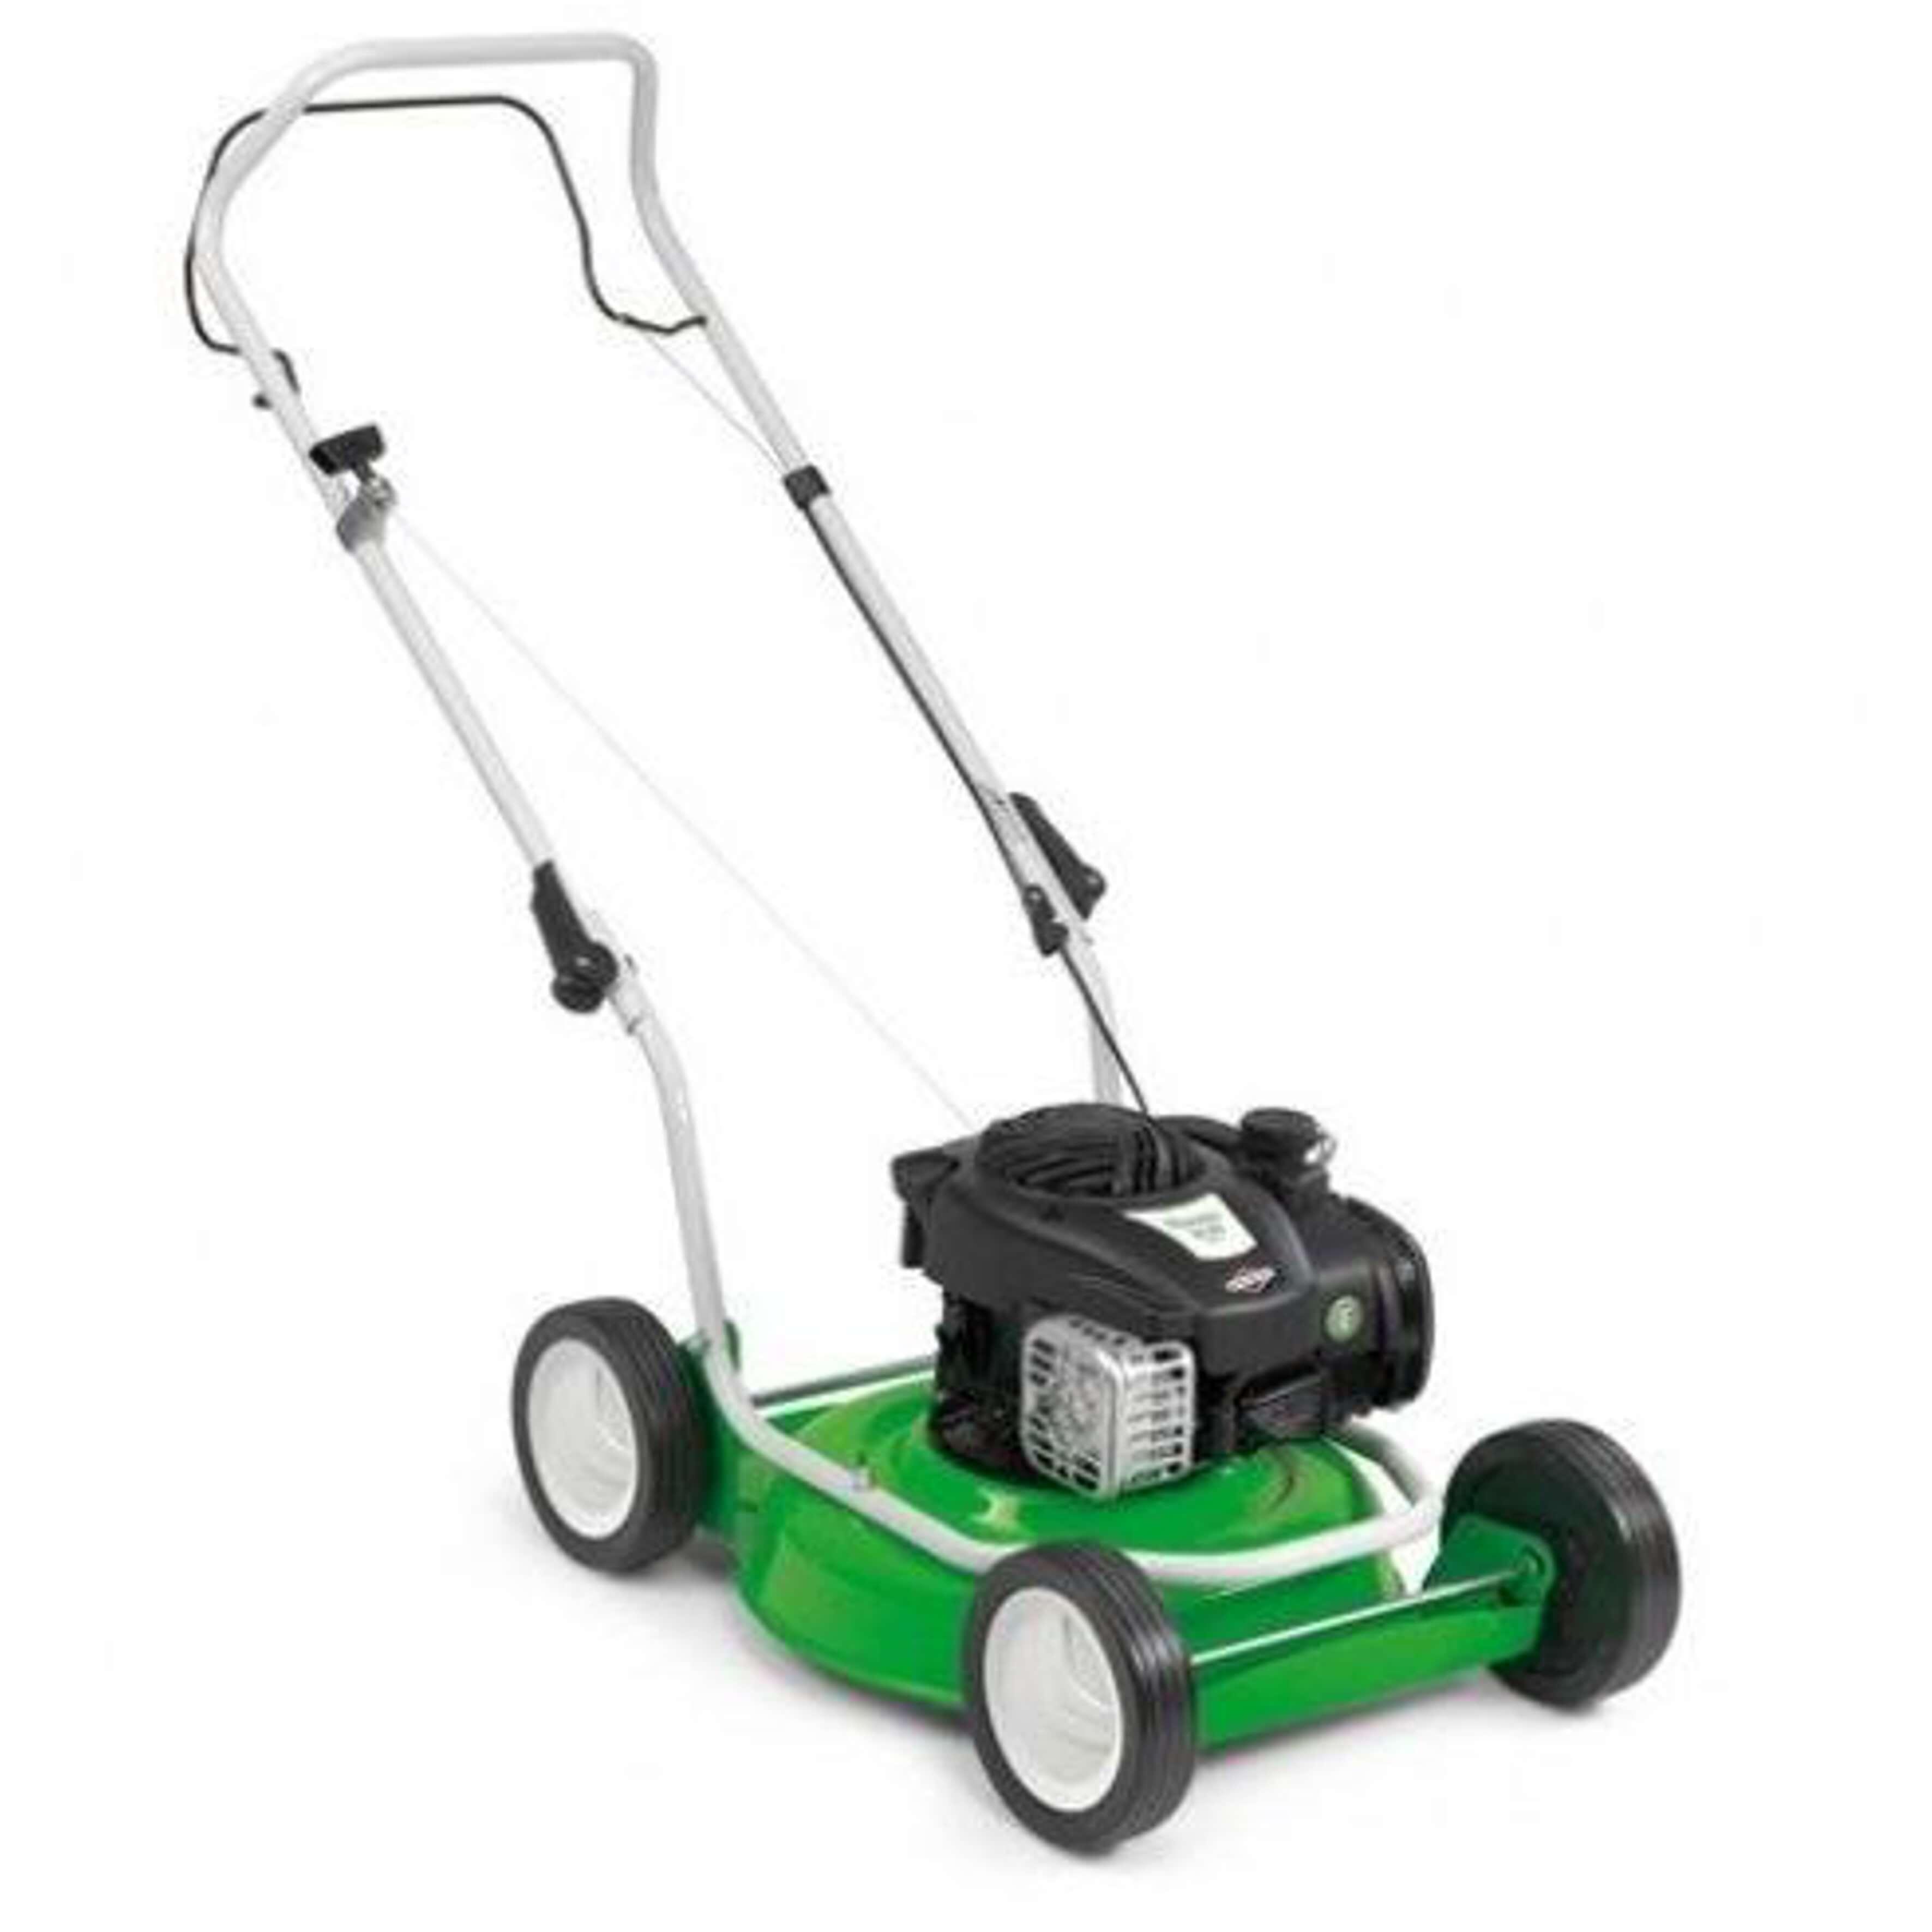 Viking MB 2.2 R Petrol Lawn Mowers